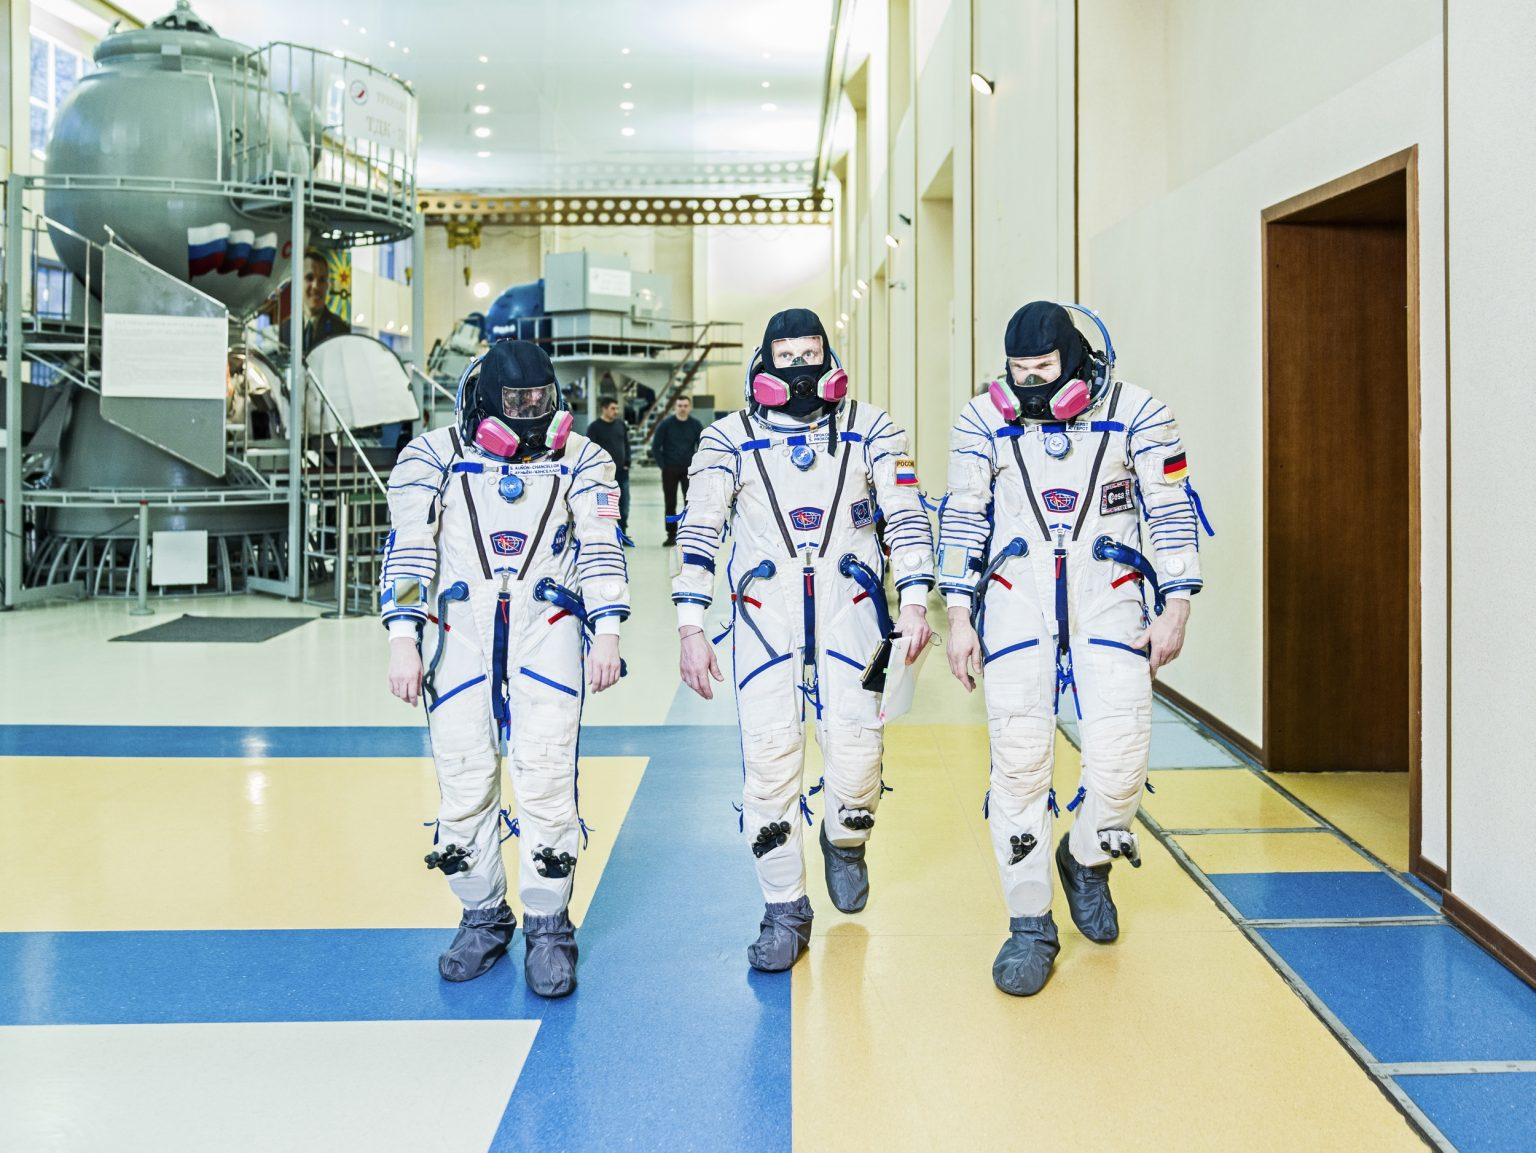 From left to right astronauts: Serena M. Auñón-Chancellor (NASA), Alexander Gerst (ESA), Sergei Prokopyev (Roscosmos) walking toward the Soyuz Simulator. Star City, Russia, 2018